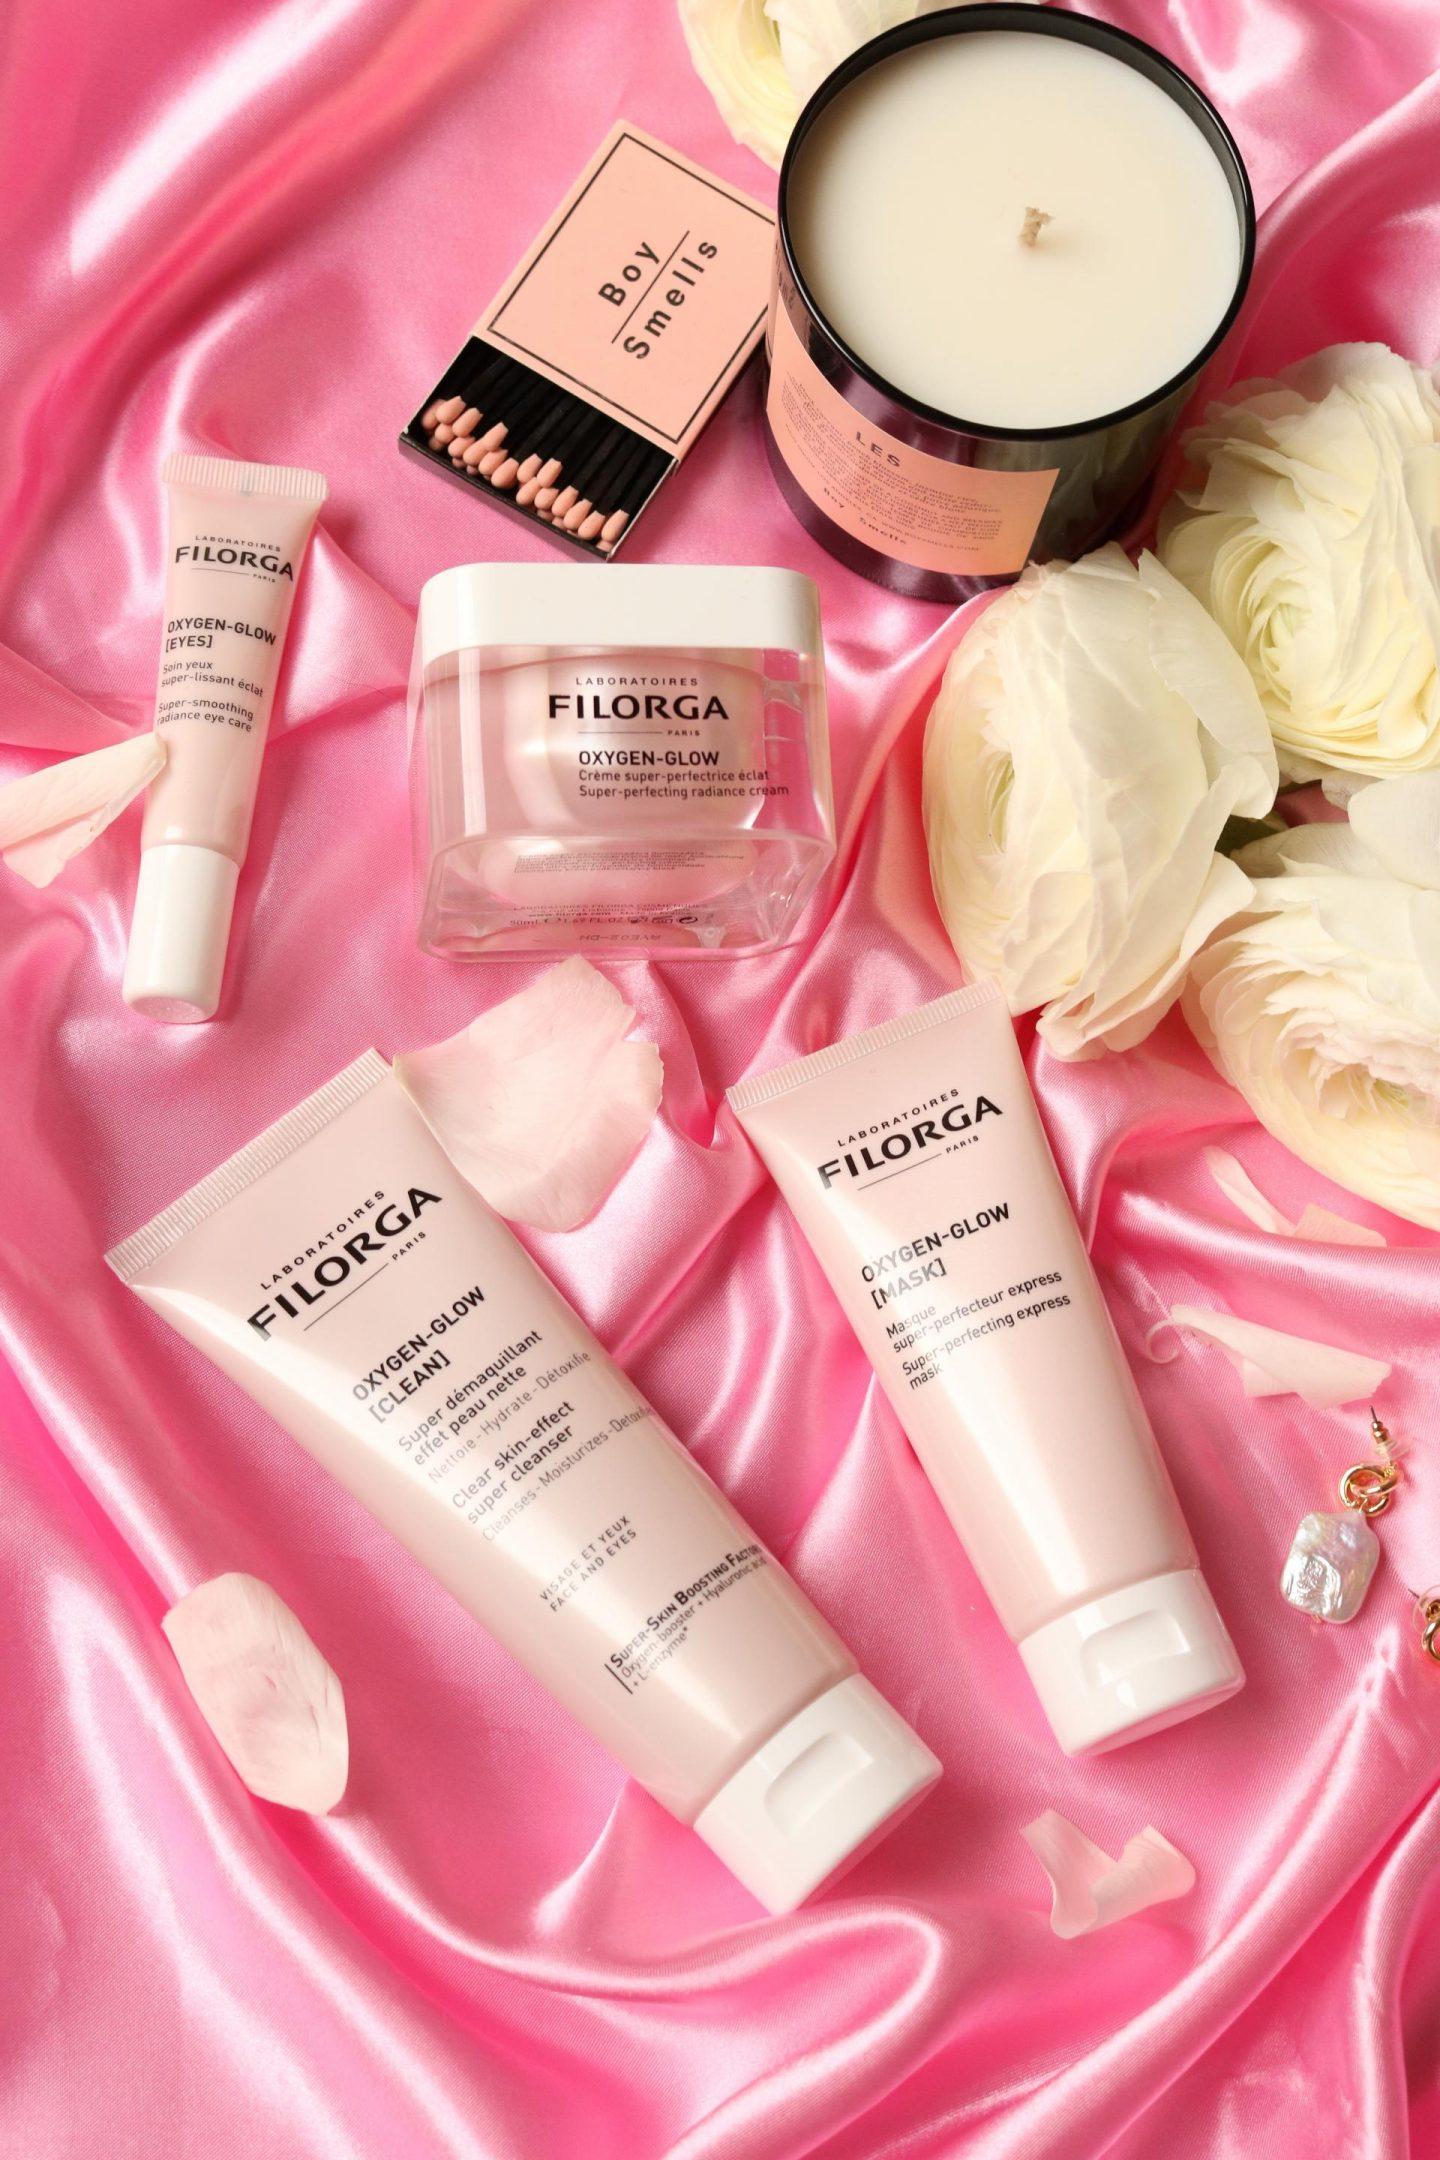 Filorga Oxygen-Glow products